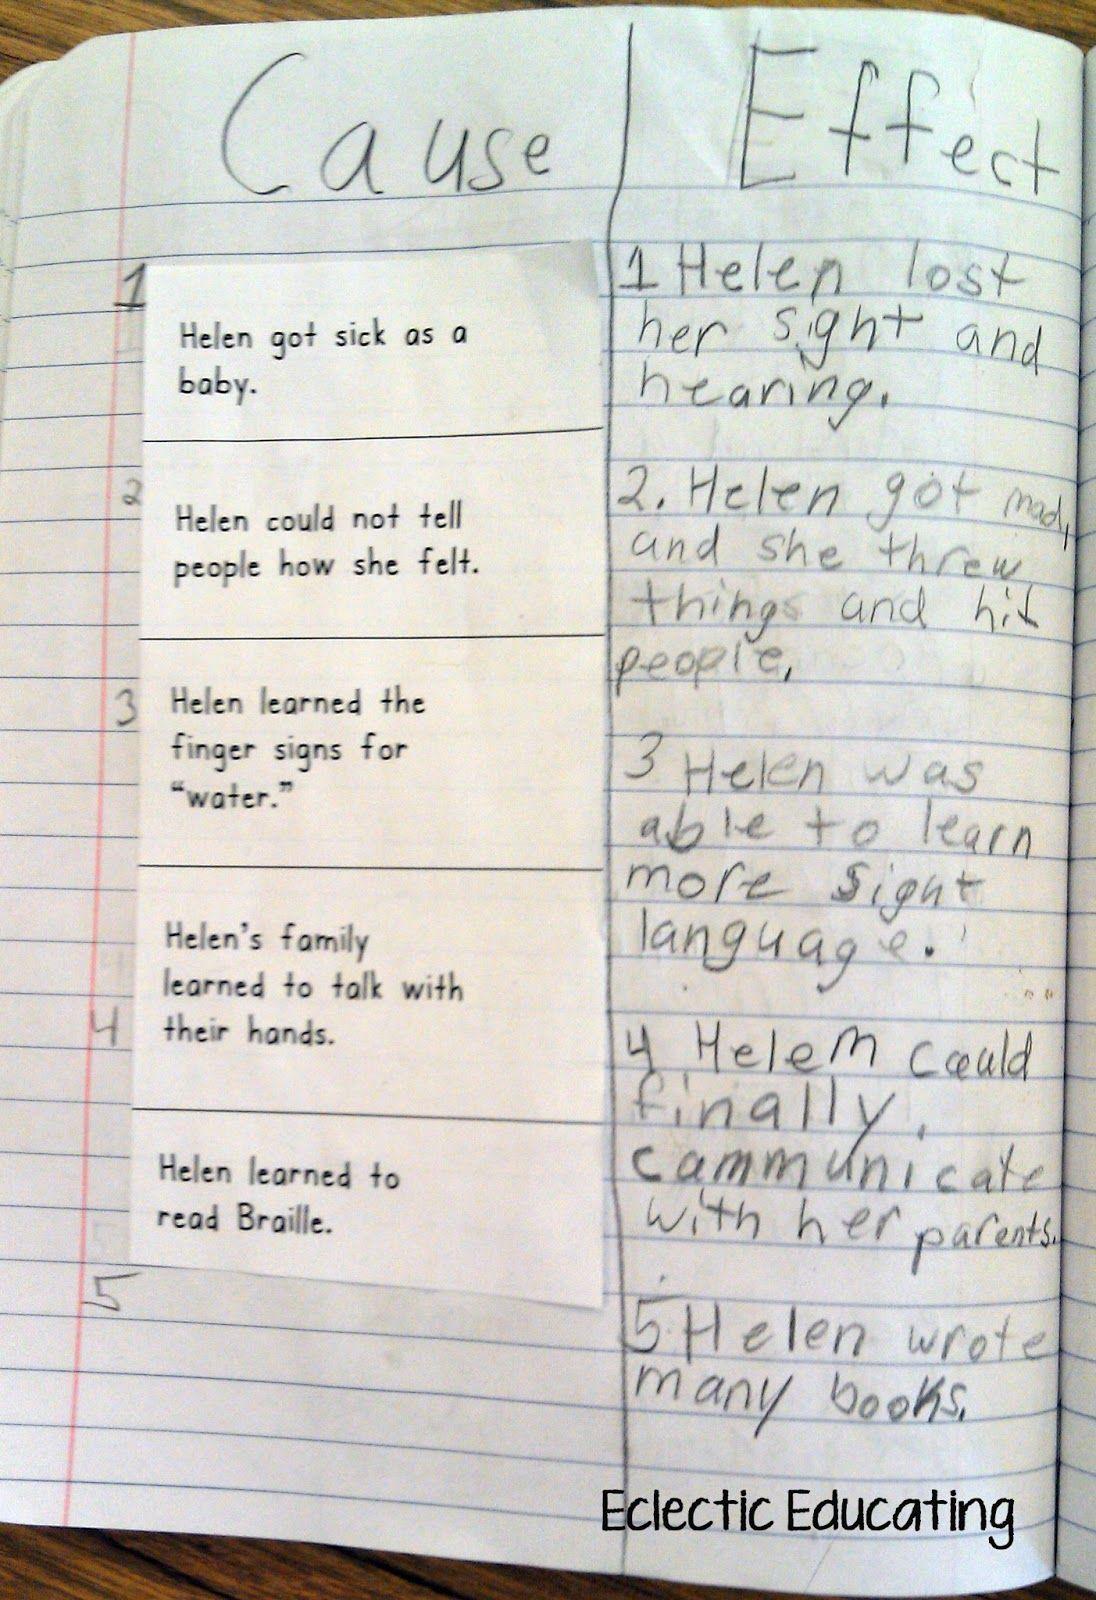 hight resolution of Eclectic Educating: Close Reading with Helen Keller   Helen keller  activities